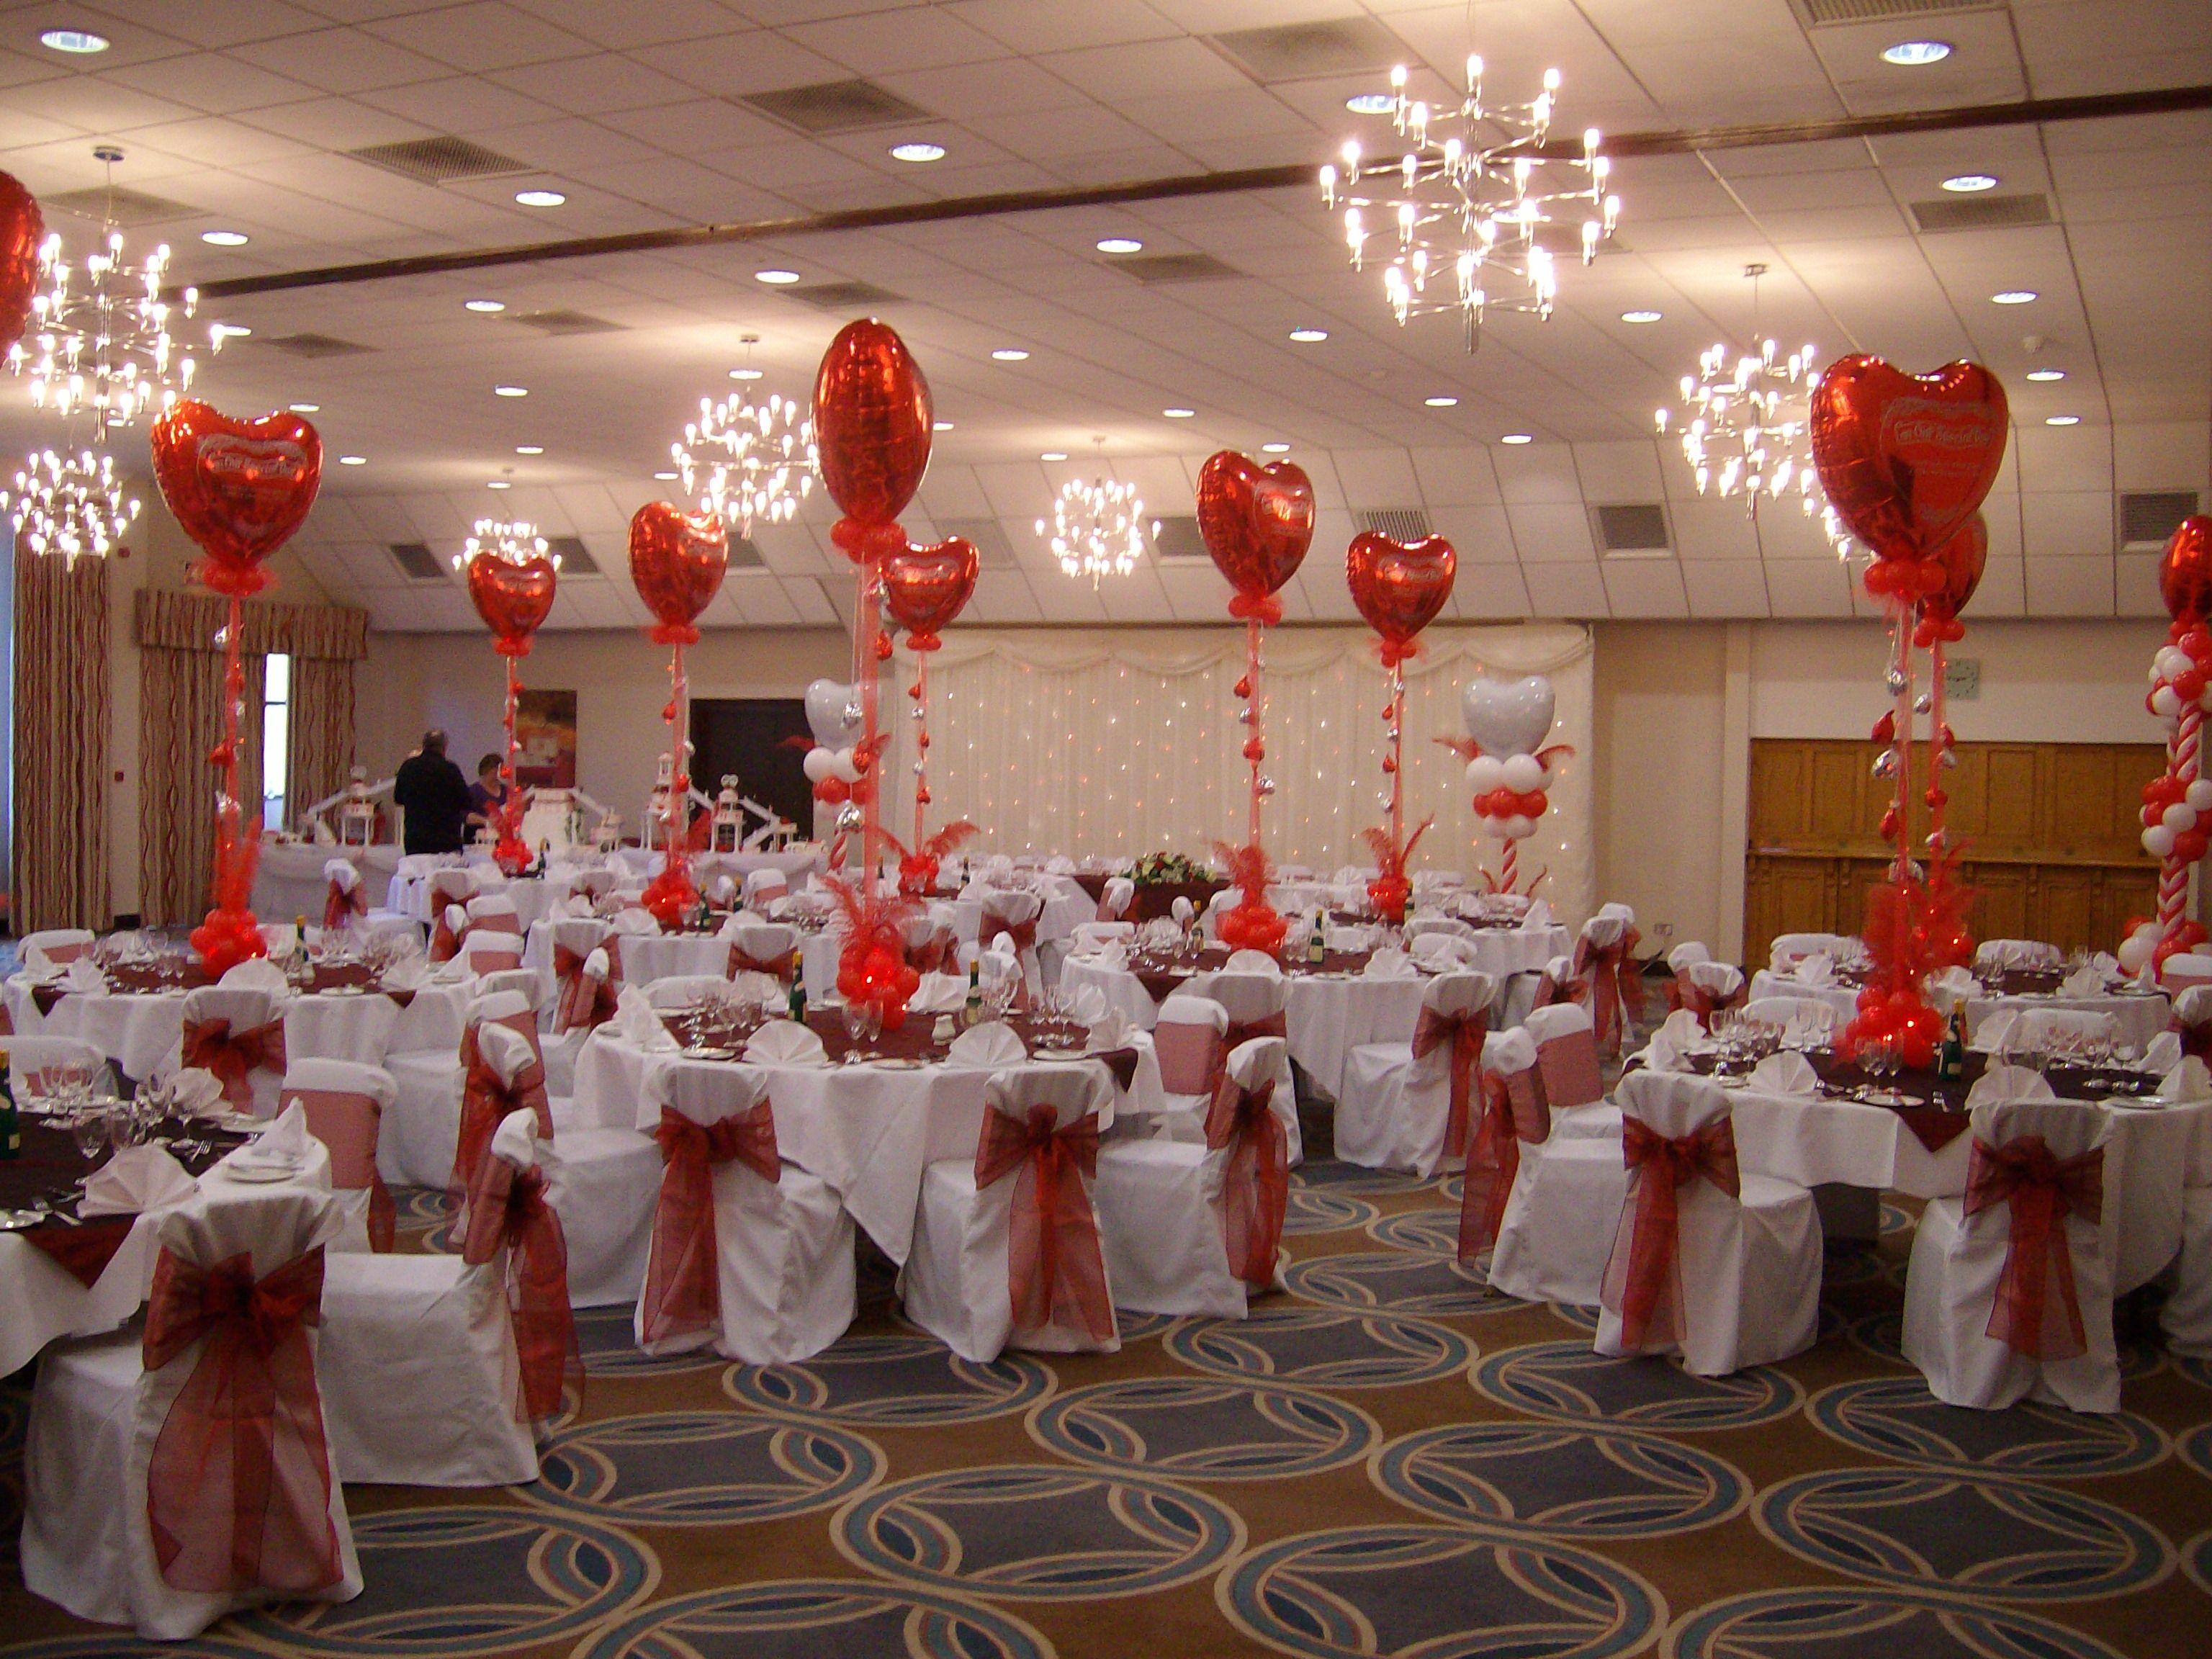 San Valentin Decoration Centros De Mesa Con Globos Metalizados En Forma De Corazn